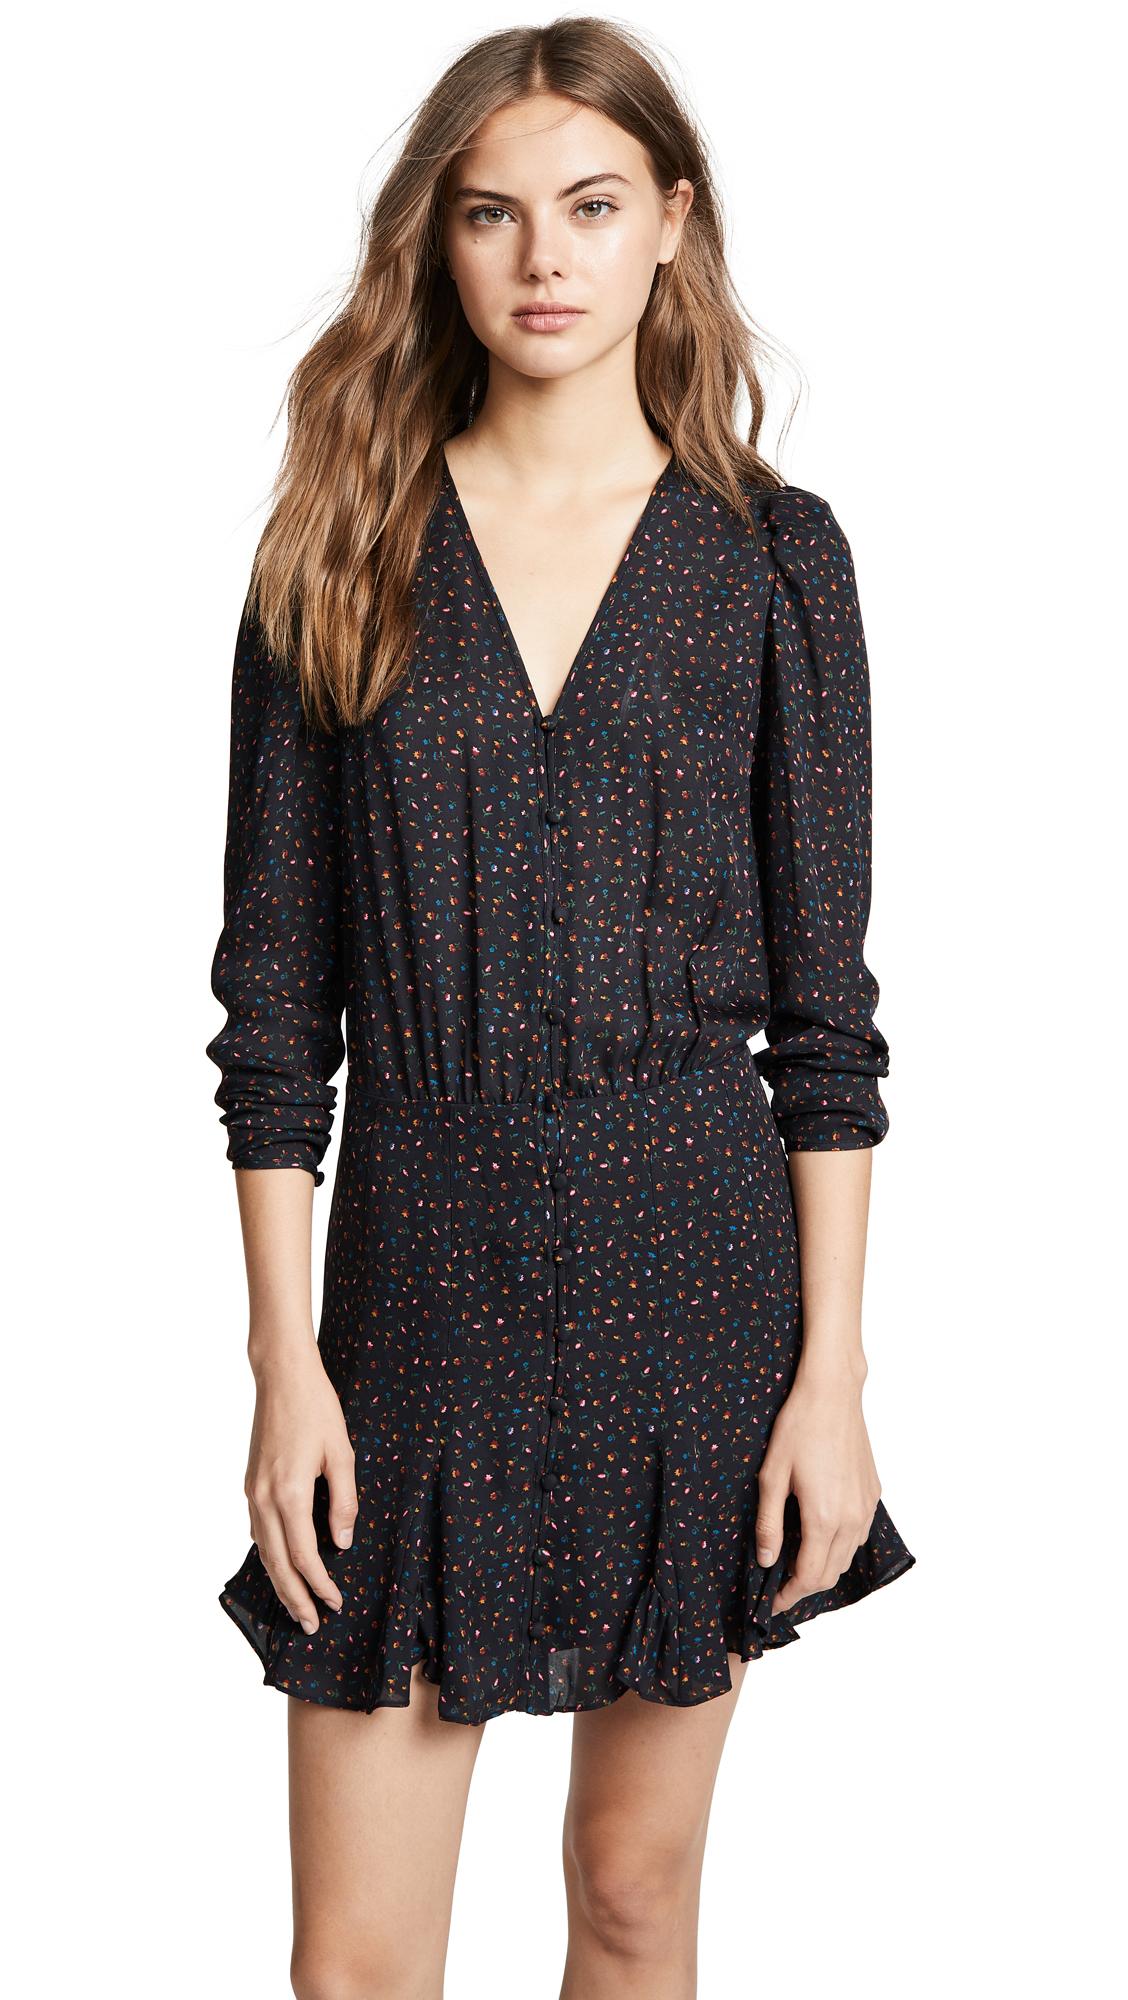 Veronica Beard Riggins Dress - Black Multi